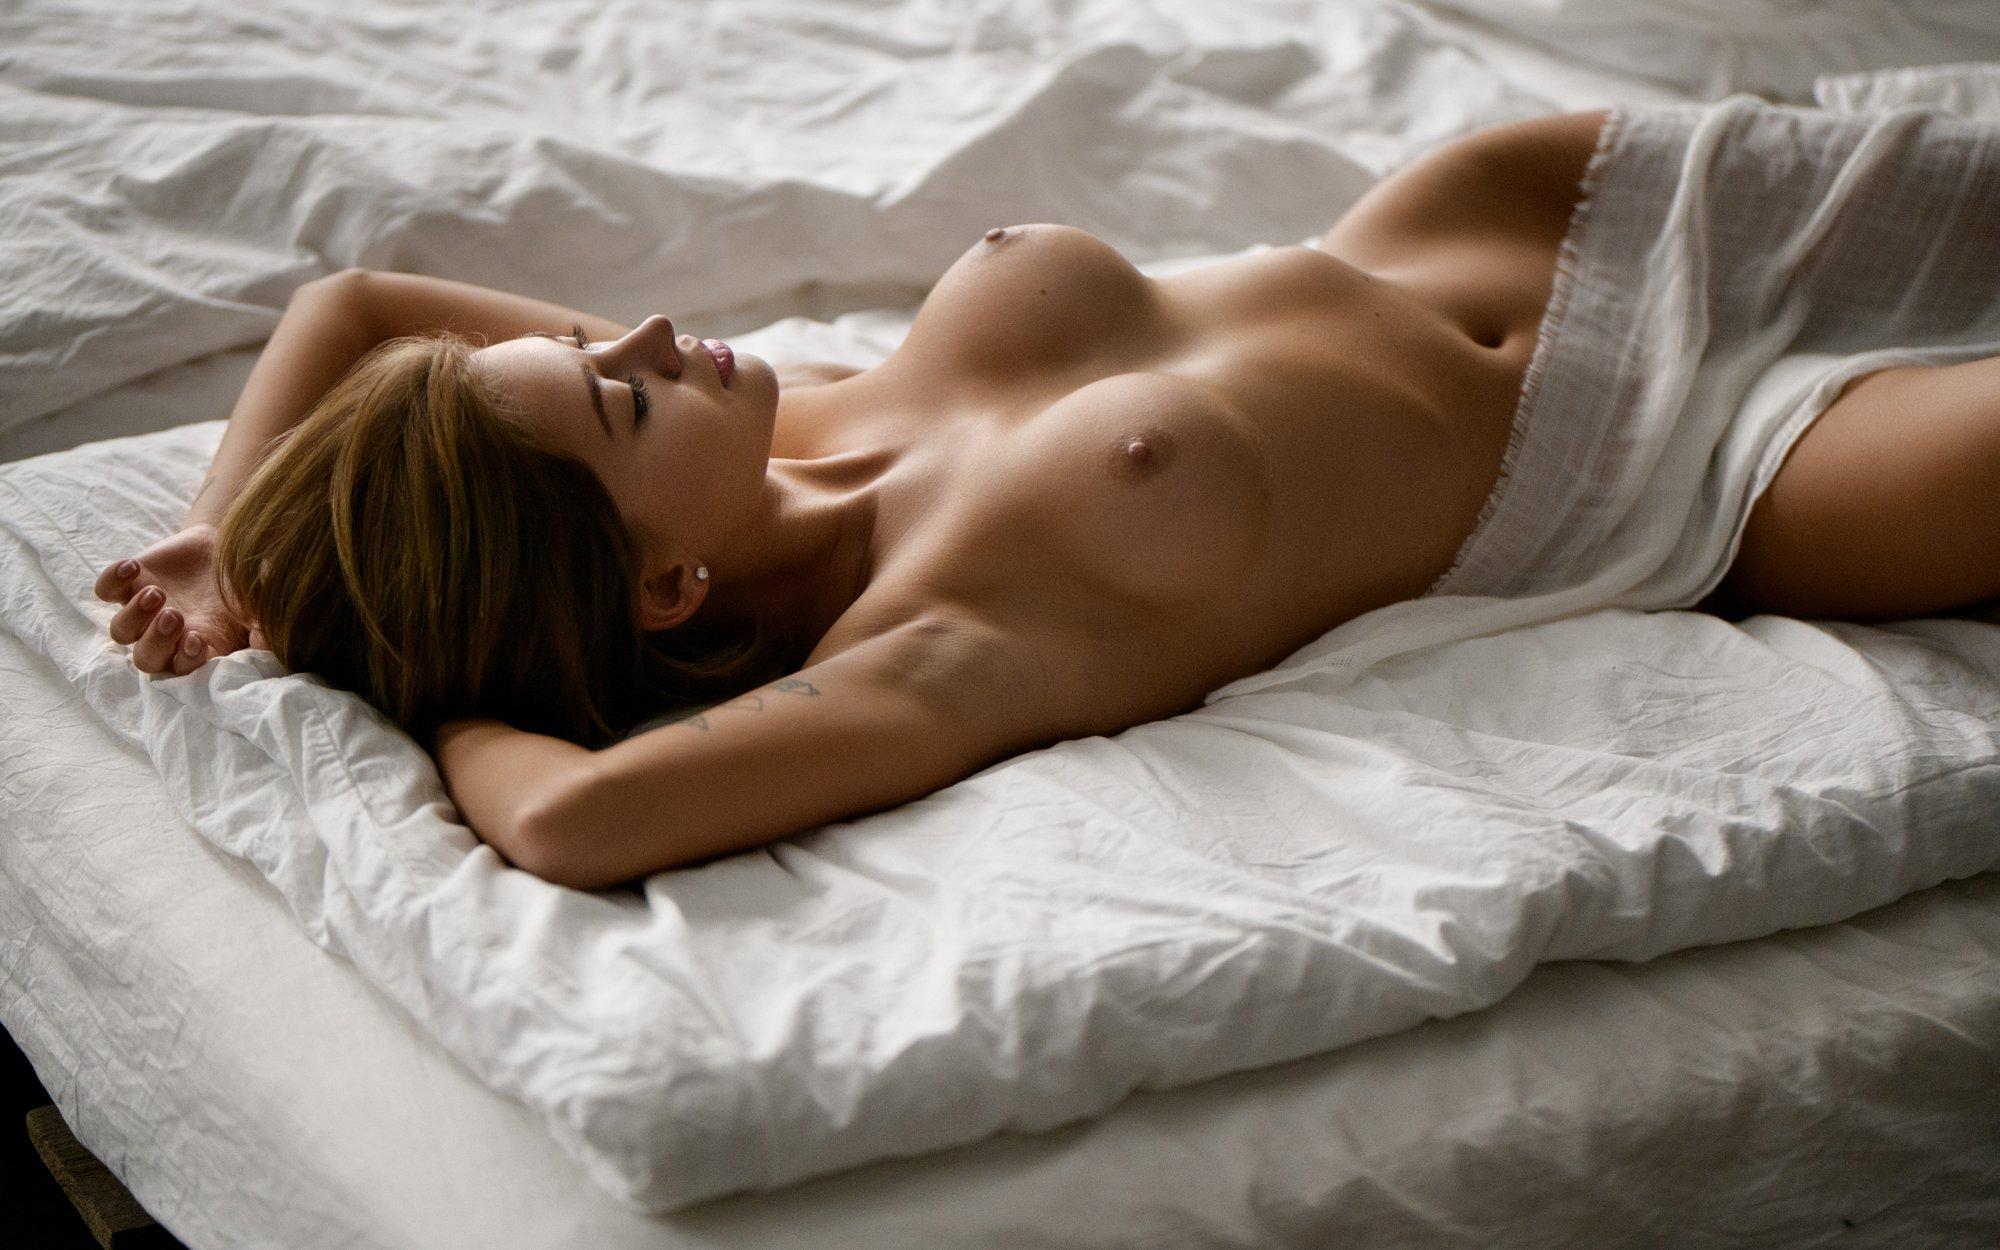 nude, fineart, sensual, seduction,, Leyendecker Sacha